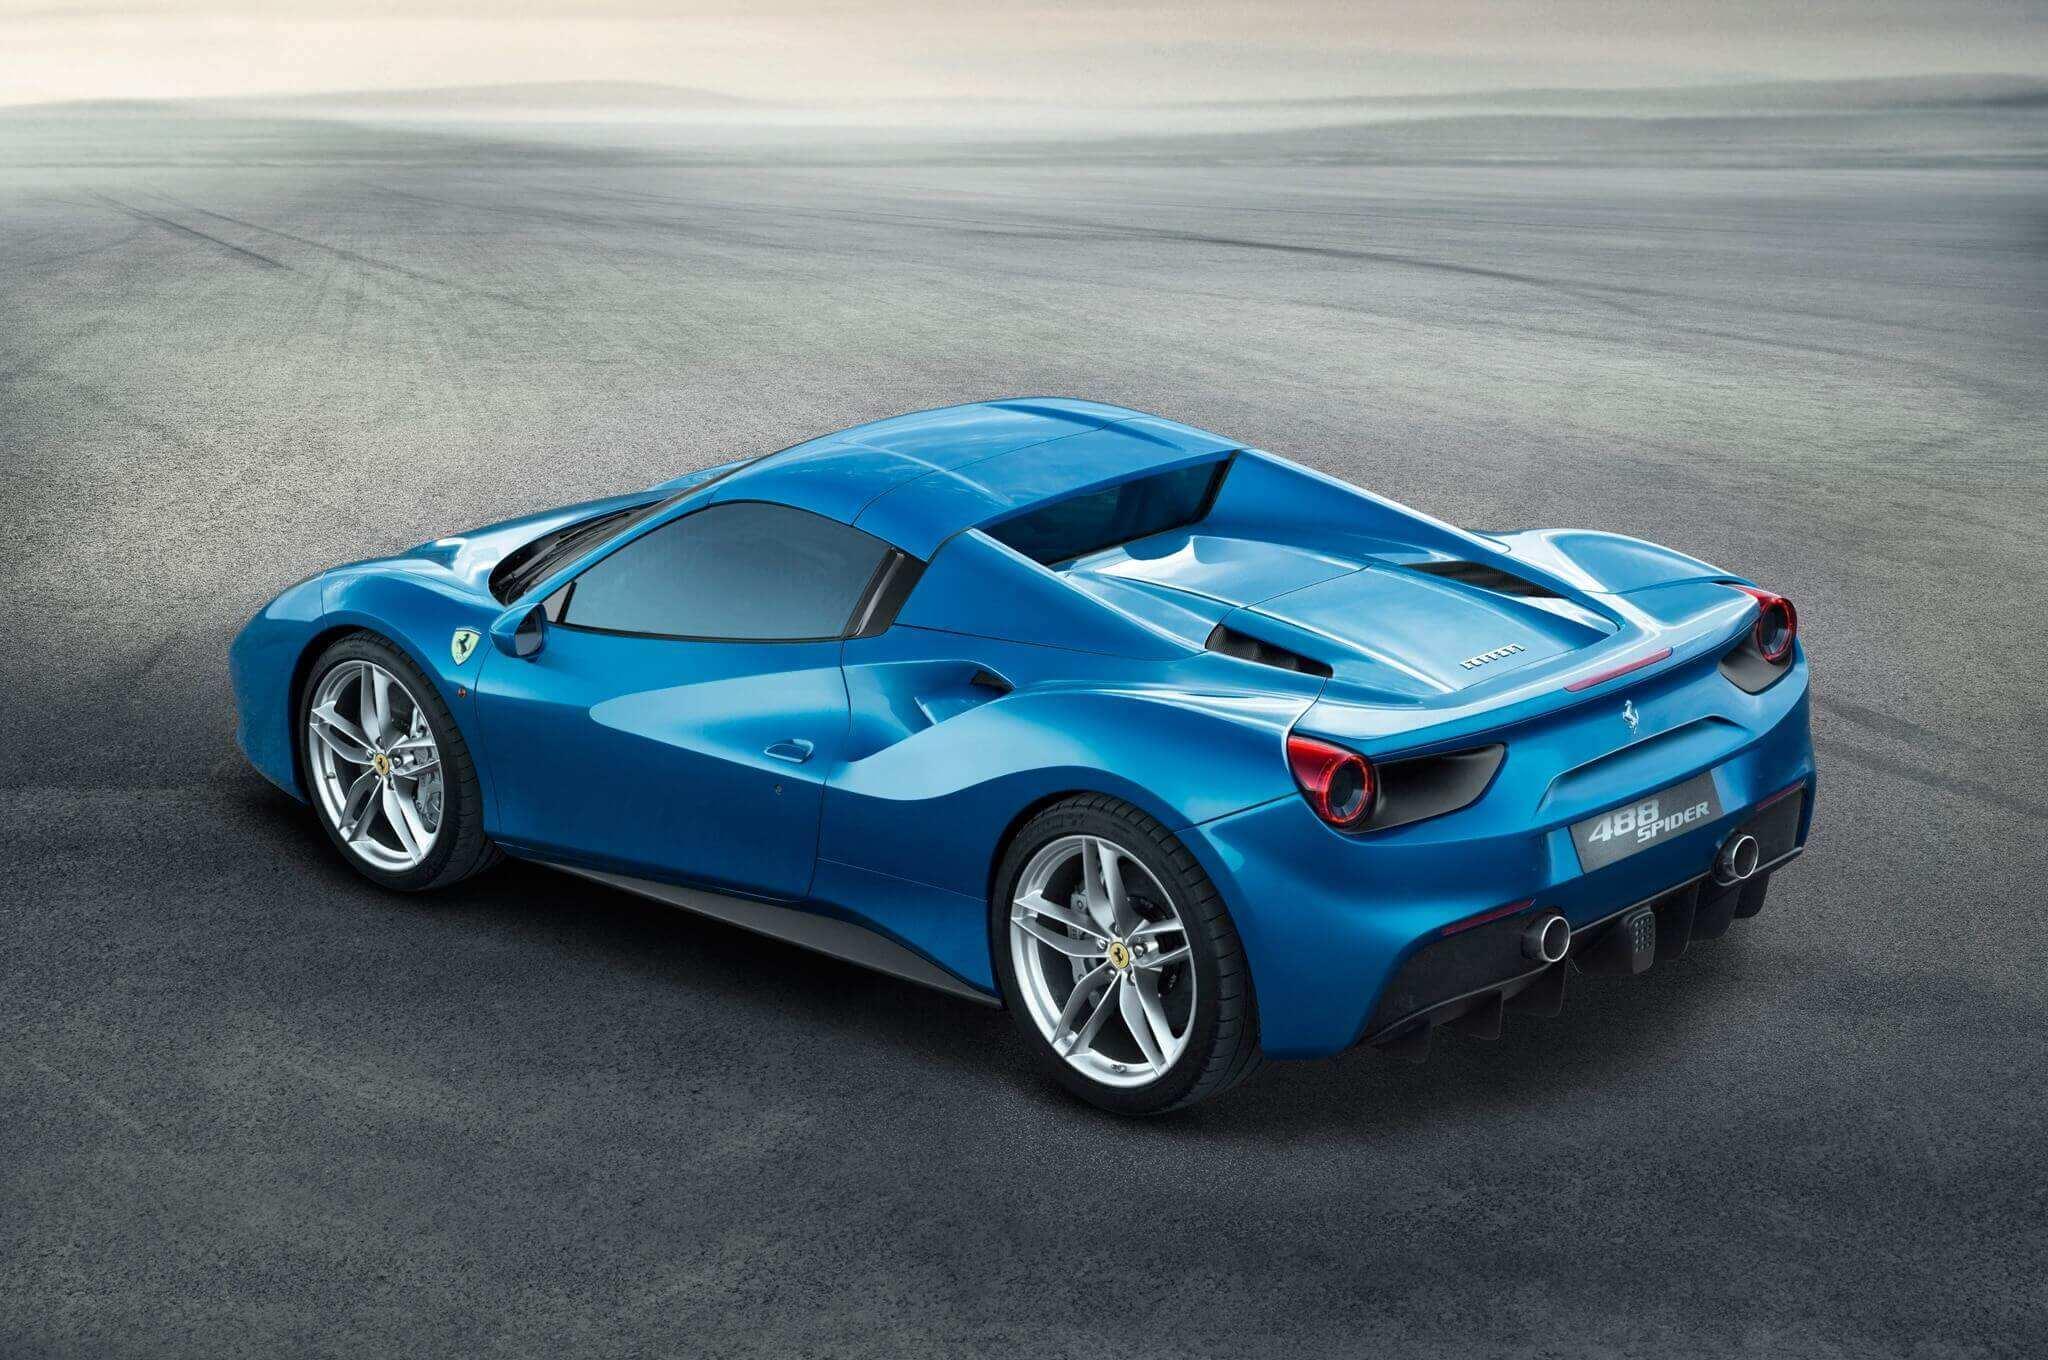 54 All New 2020 Ferrari Cars New Concept by 2020 Ferrari Cars